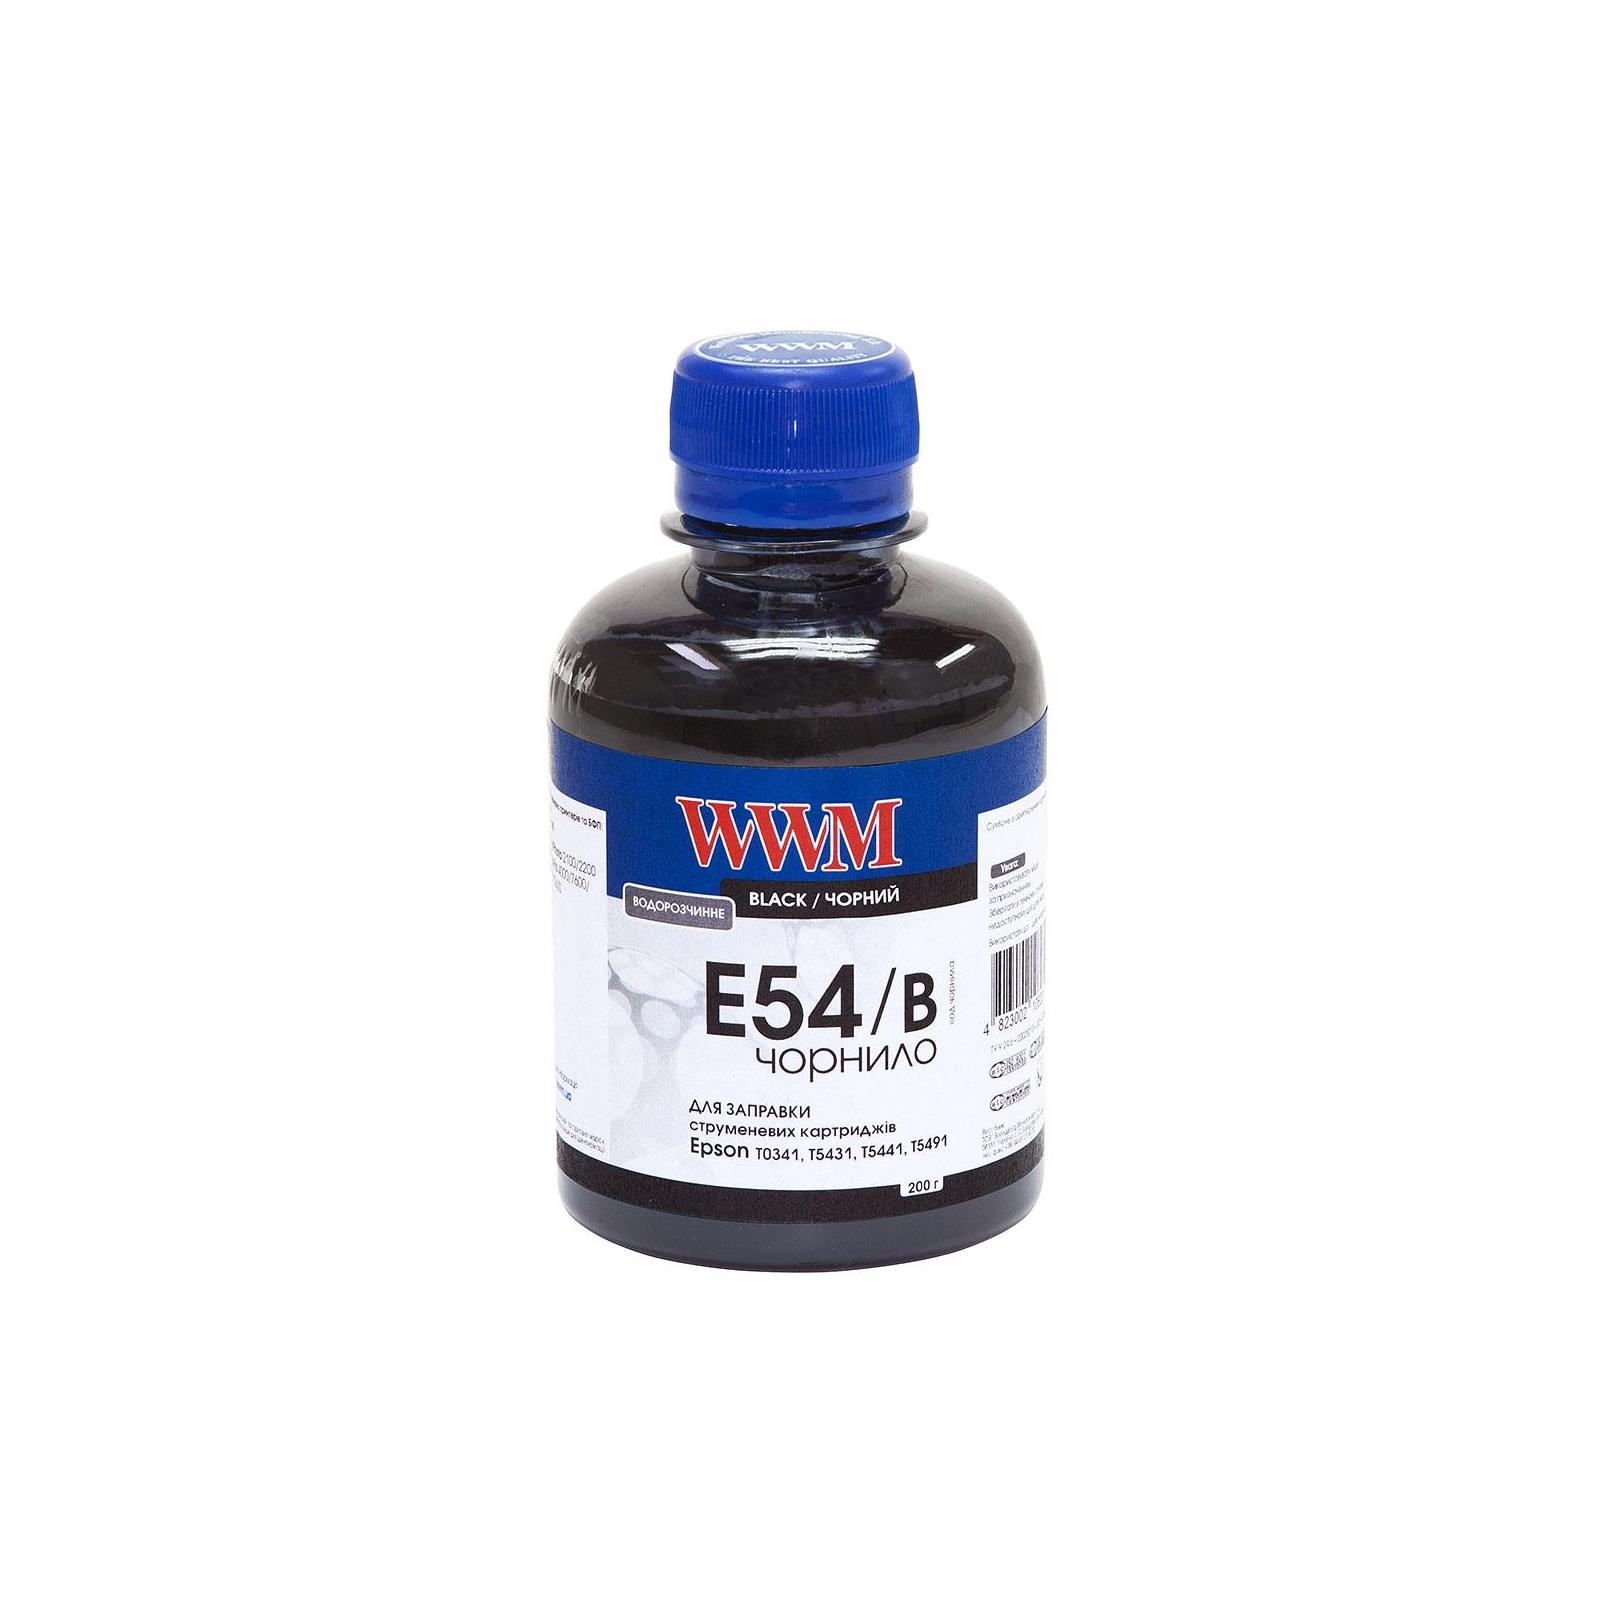 Чернила WWM EPSON StPhoto2100/2200/Pro4000/7600/9600/10600 Black (E54/B)